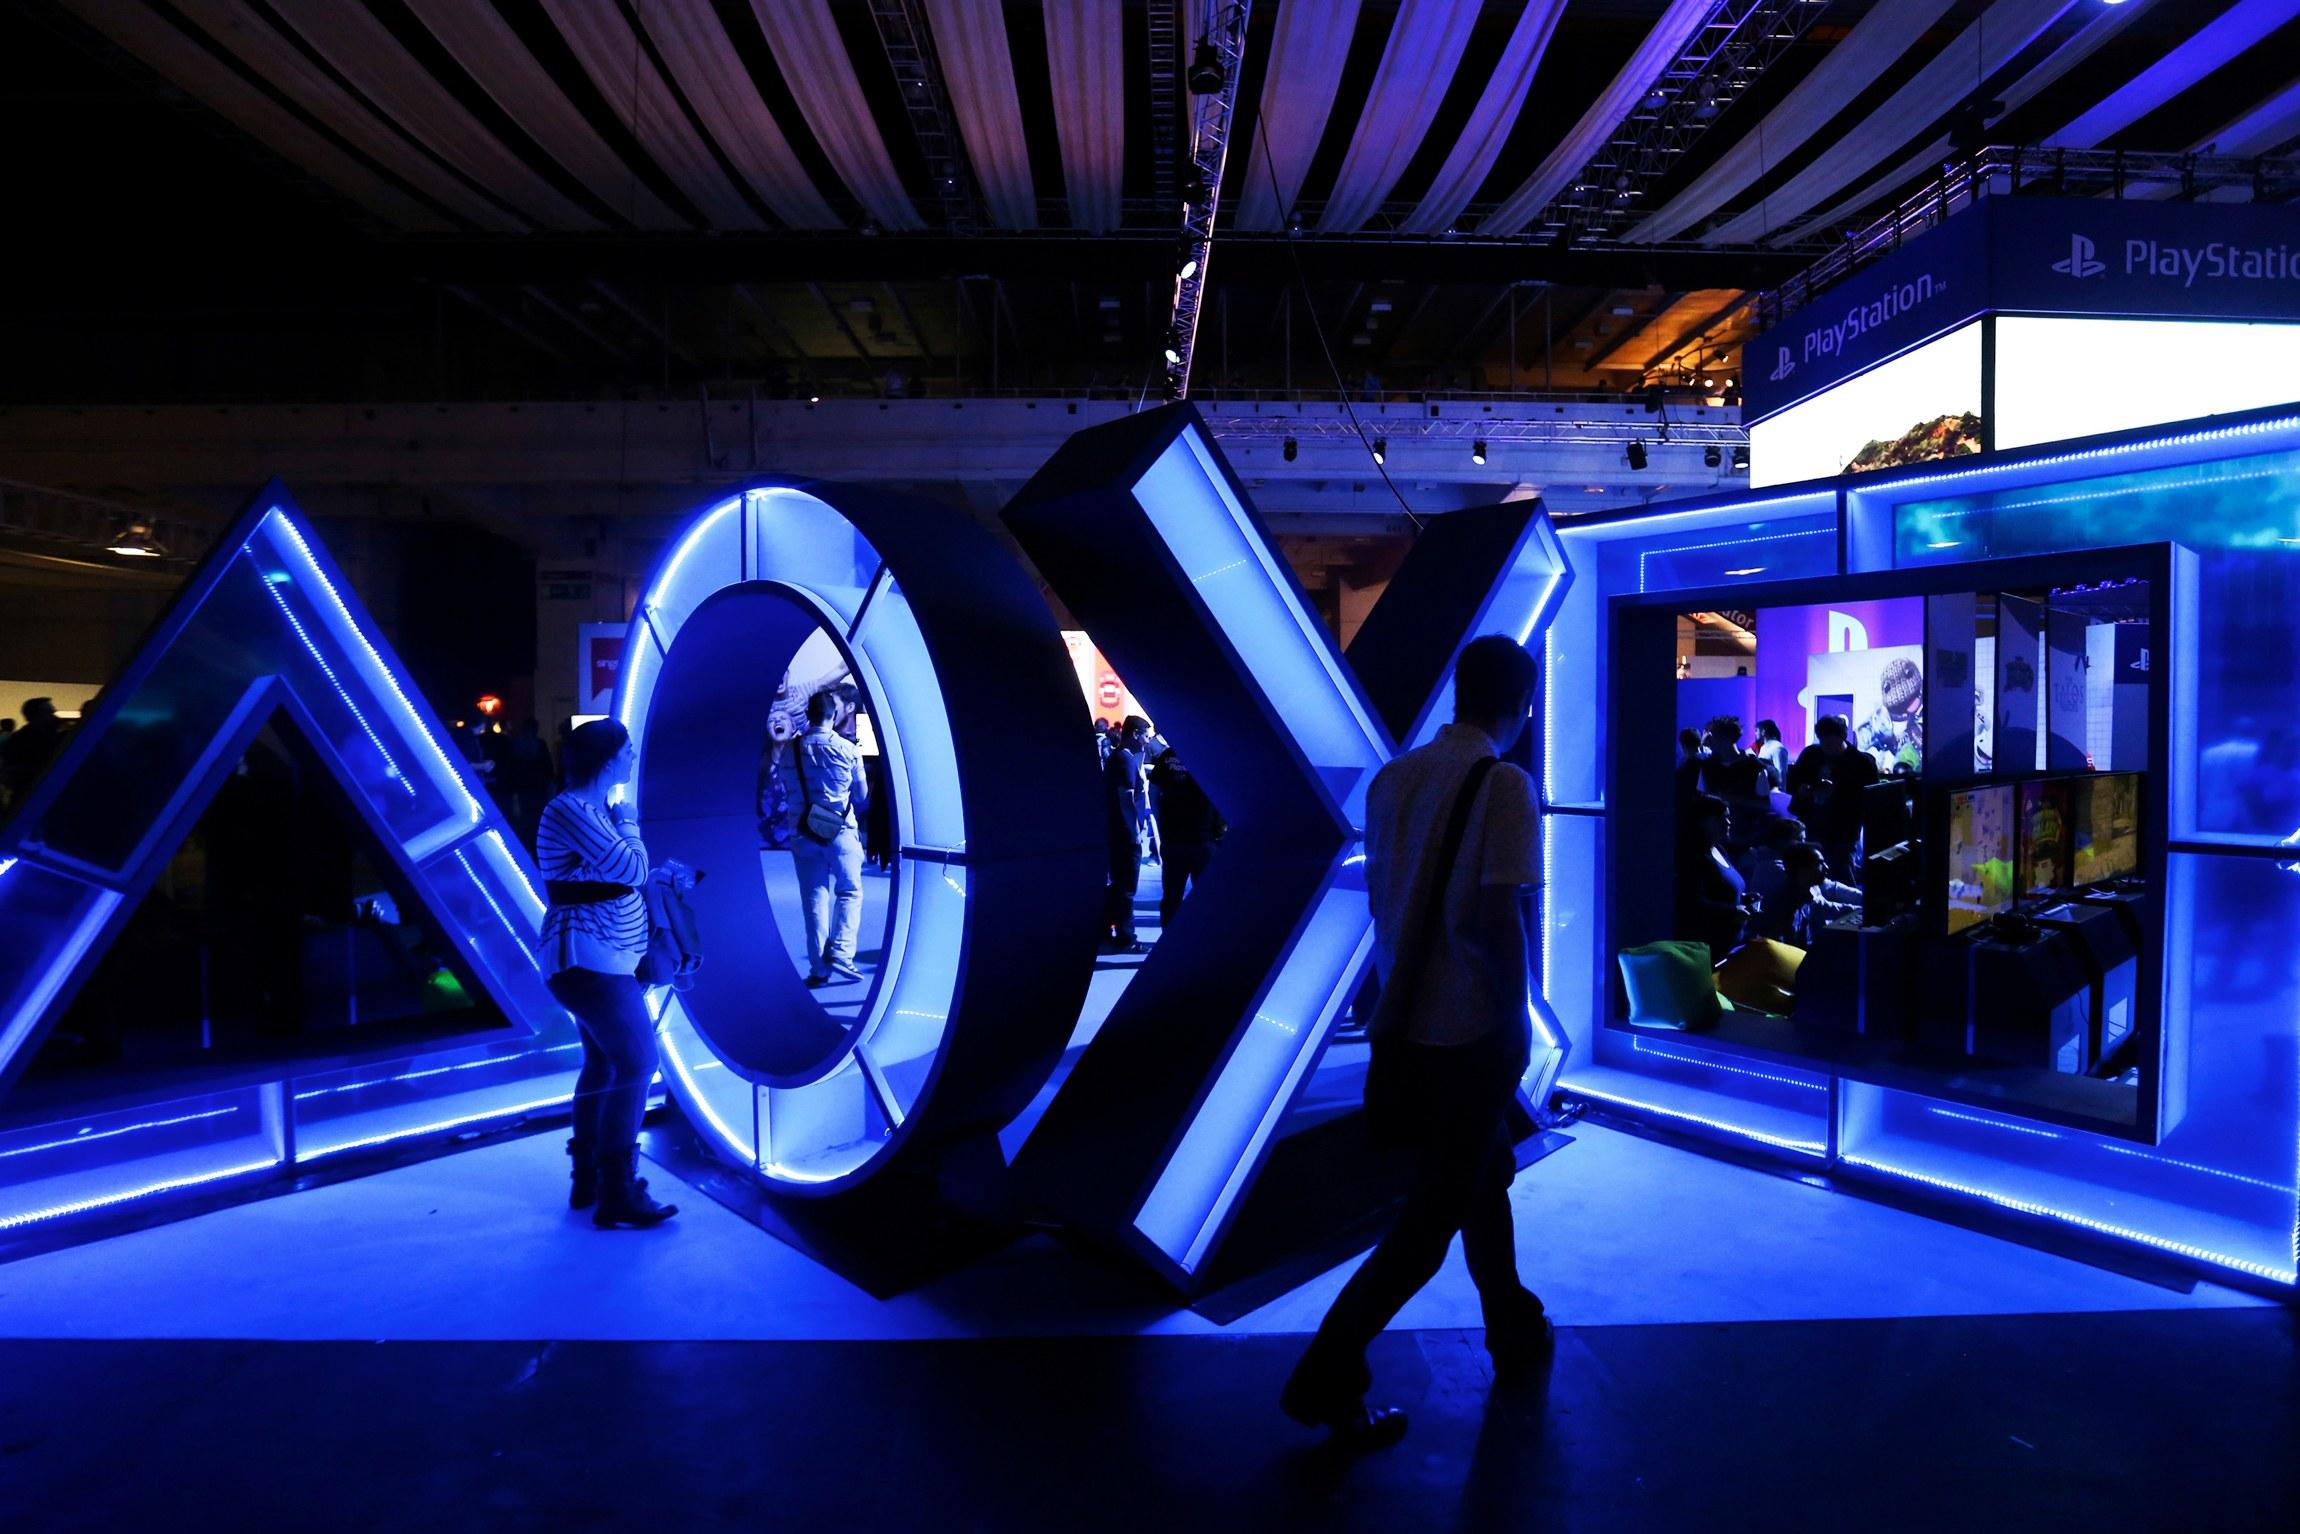 Сони PS 5 анонсировали официально: особенности идата выхода приставки